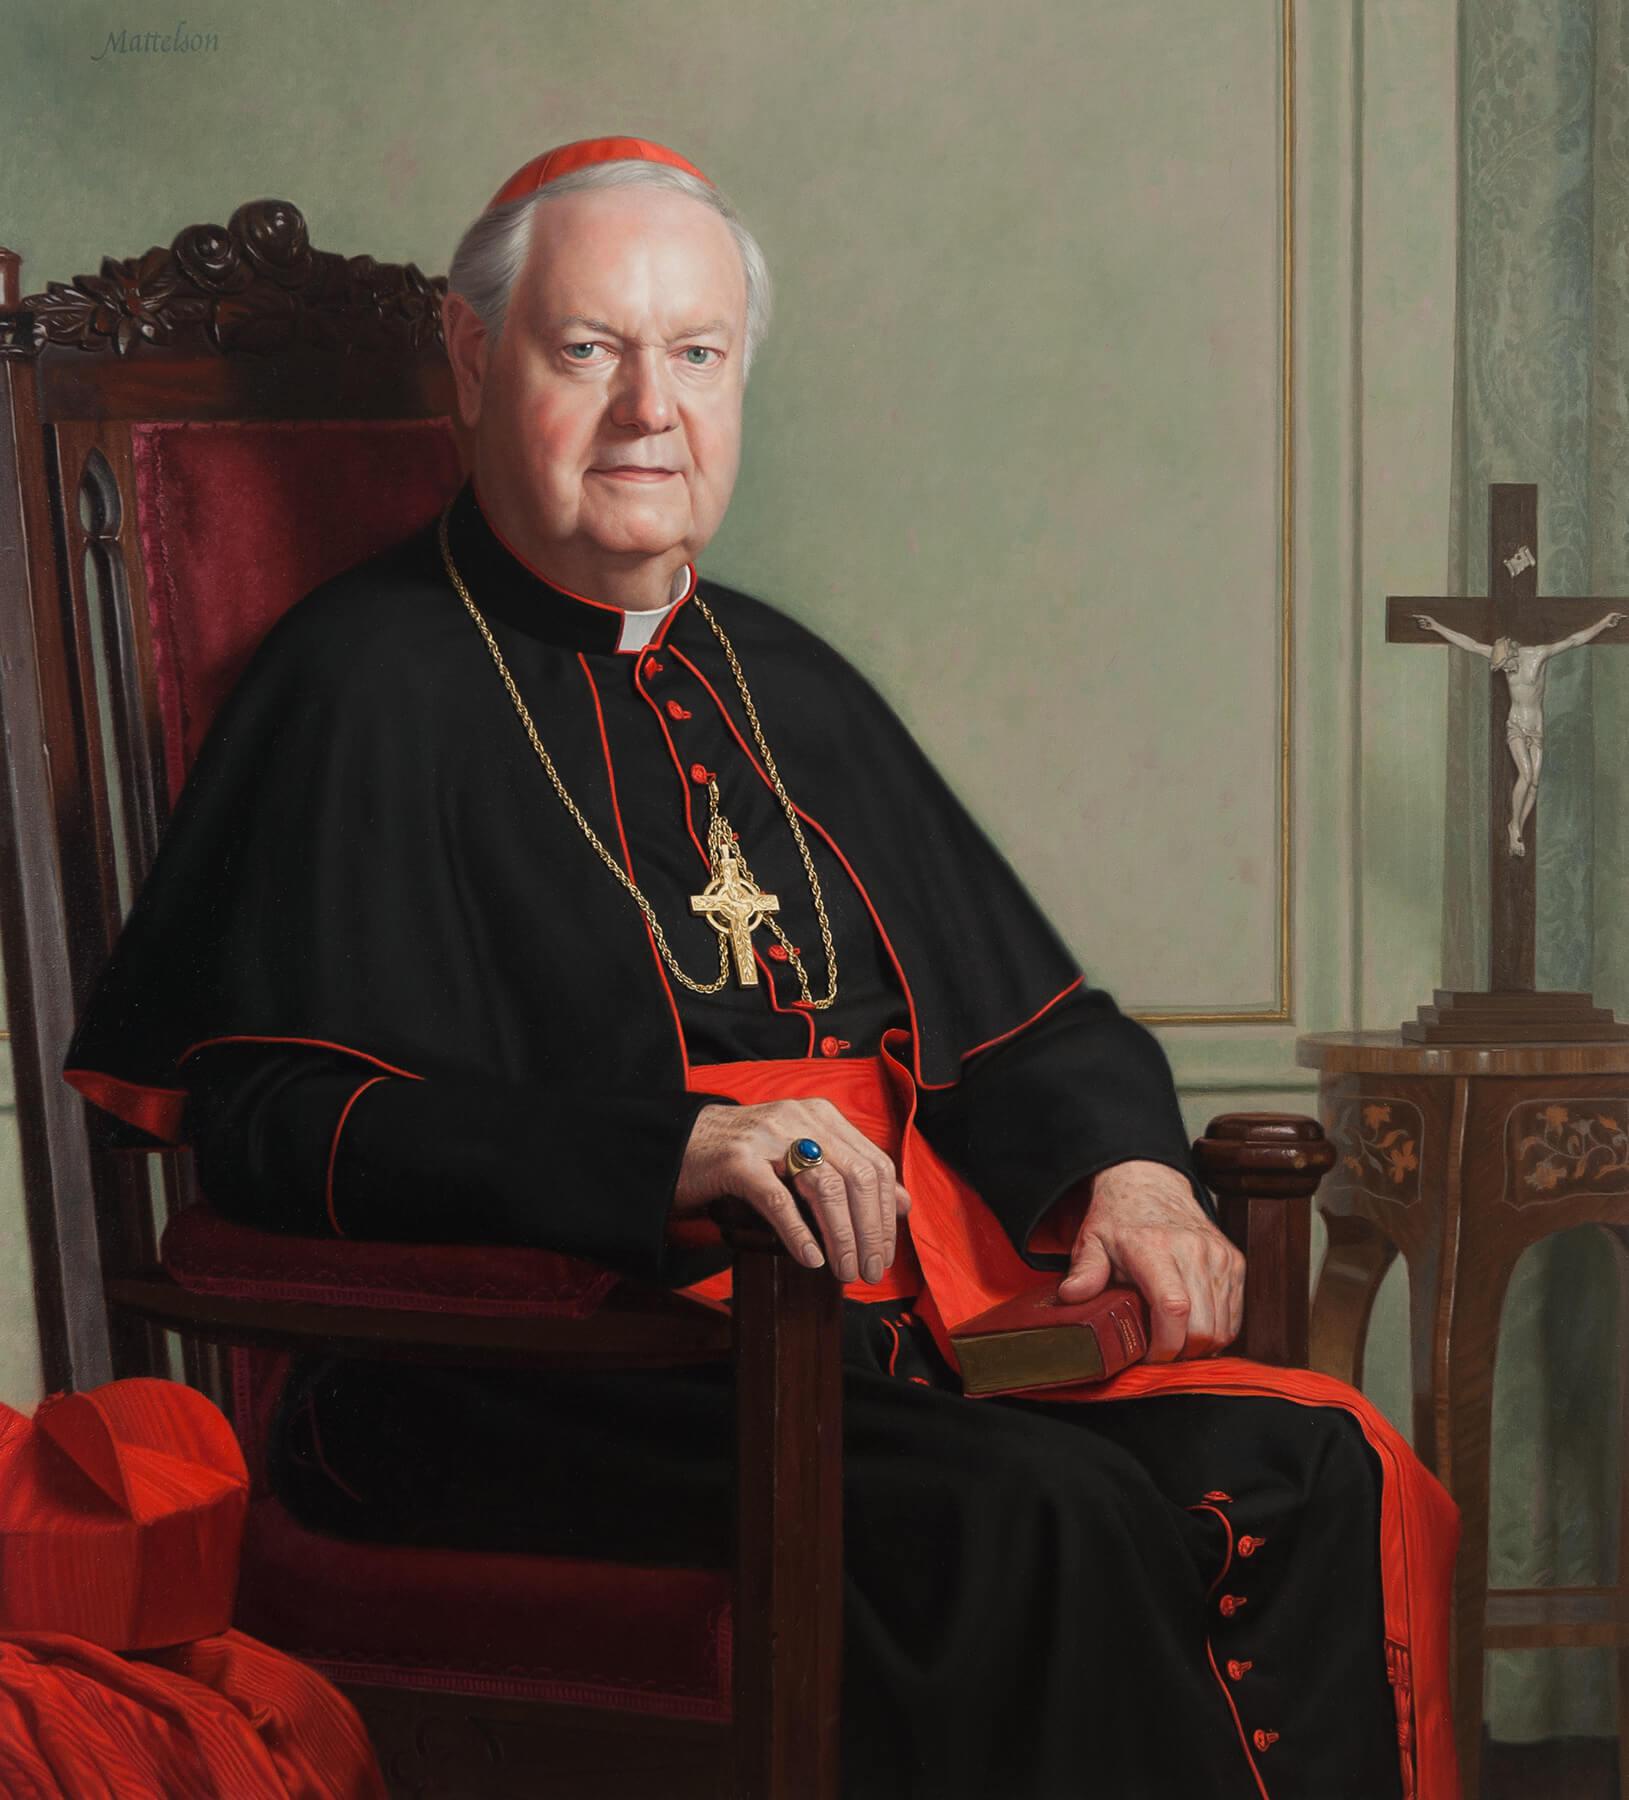 Oil Portrait od Cardinal Egan by Marvin Mattelson